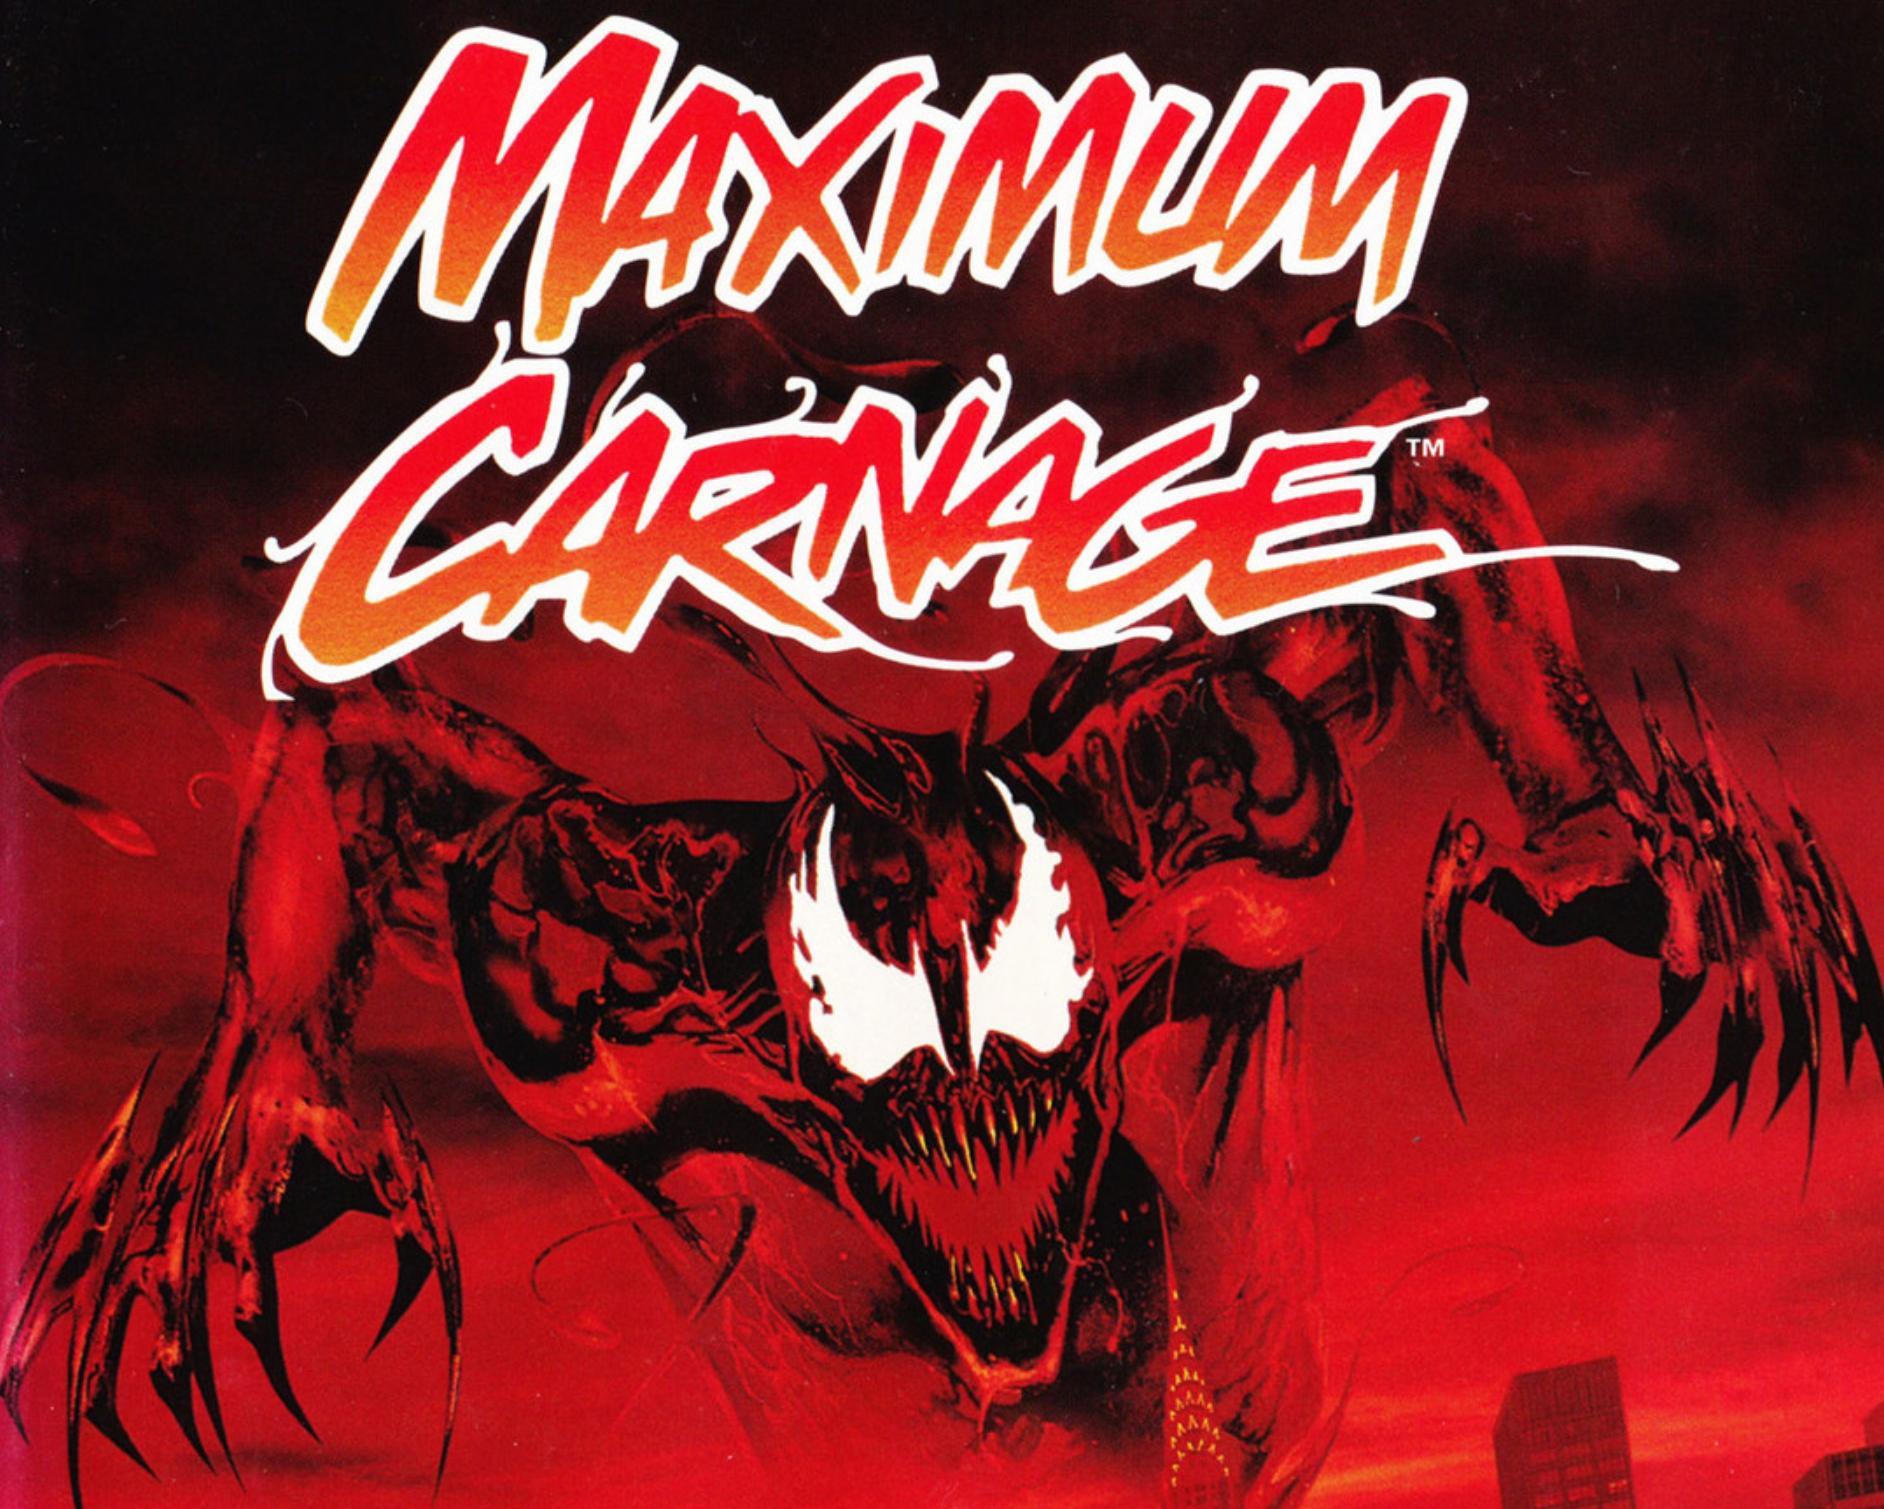 The Retrobeat Maximum Carnage Aka Spider Man And Venom S Buddy